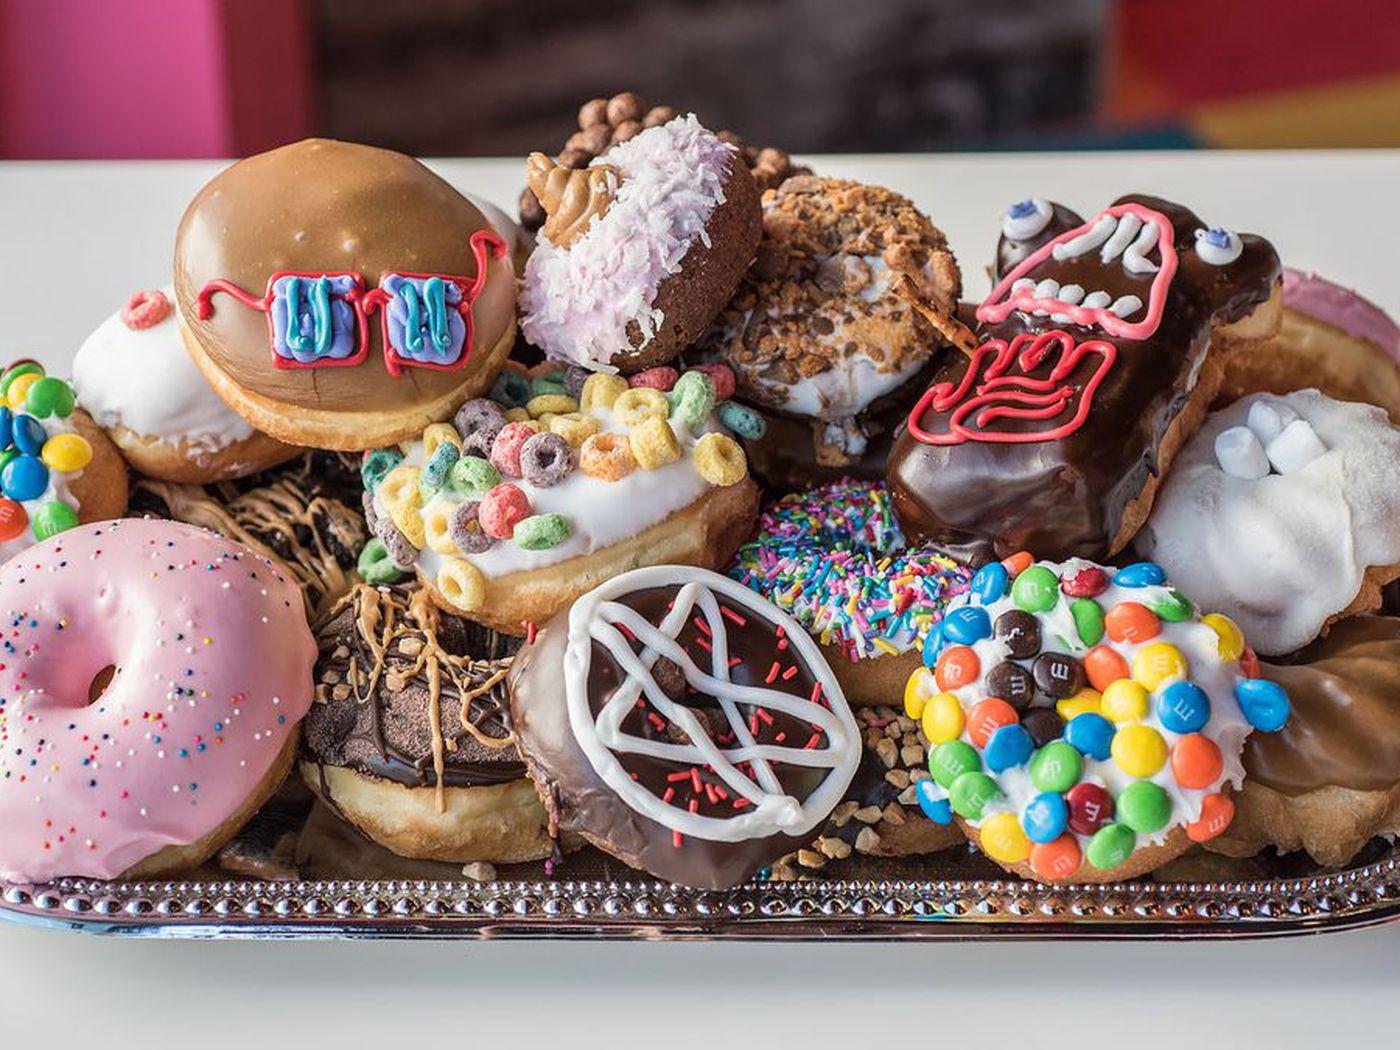 Voodoo Doughnut opens a second Denver location soon - Eater Denver